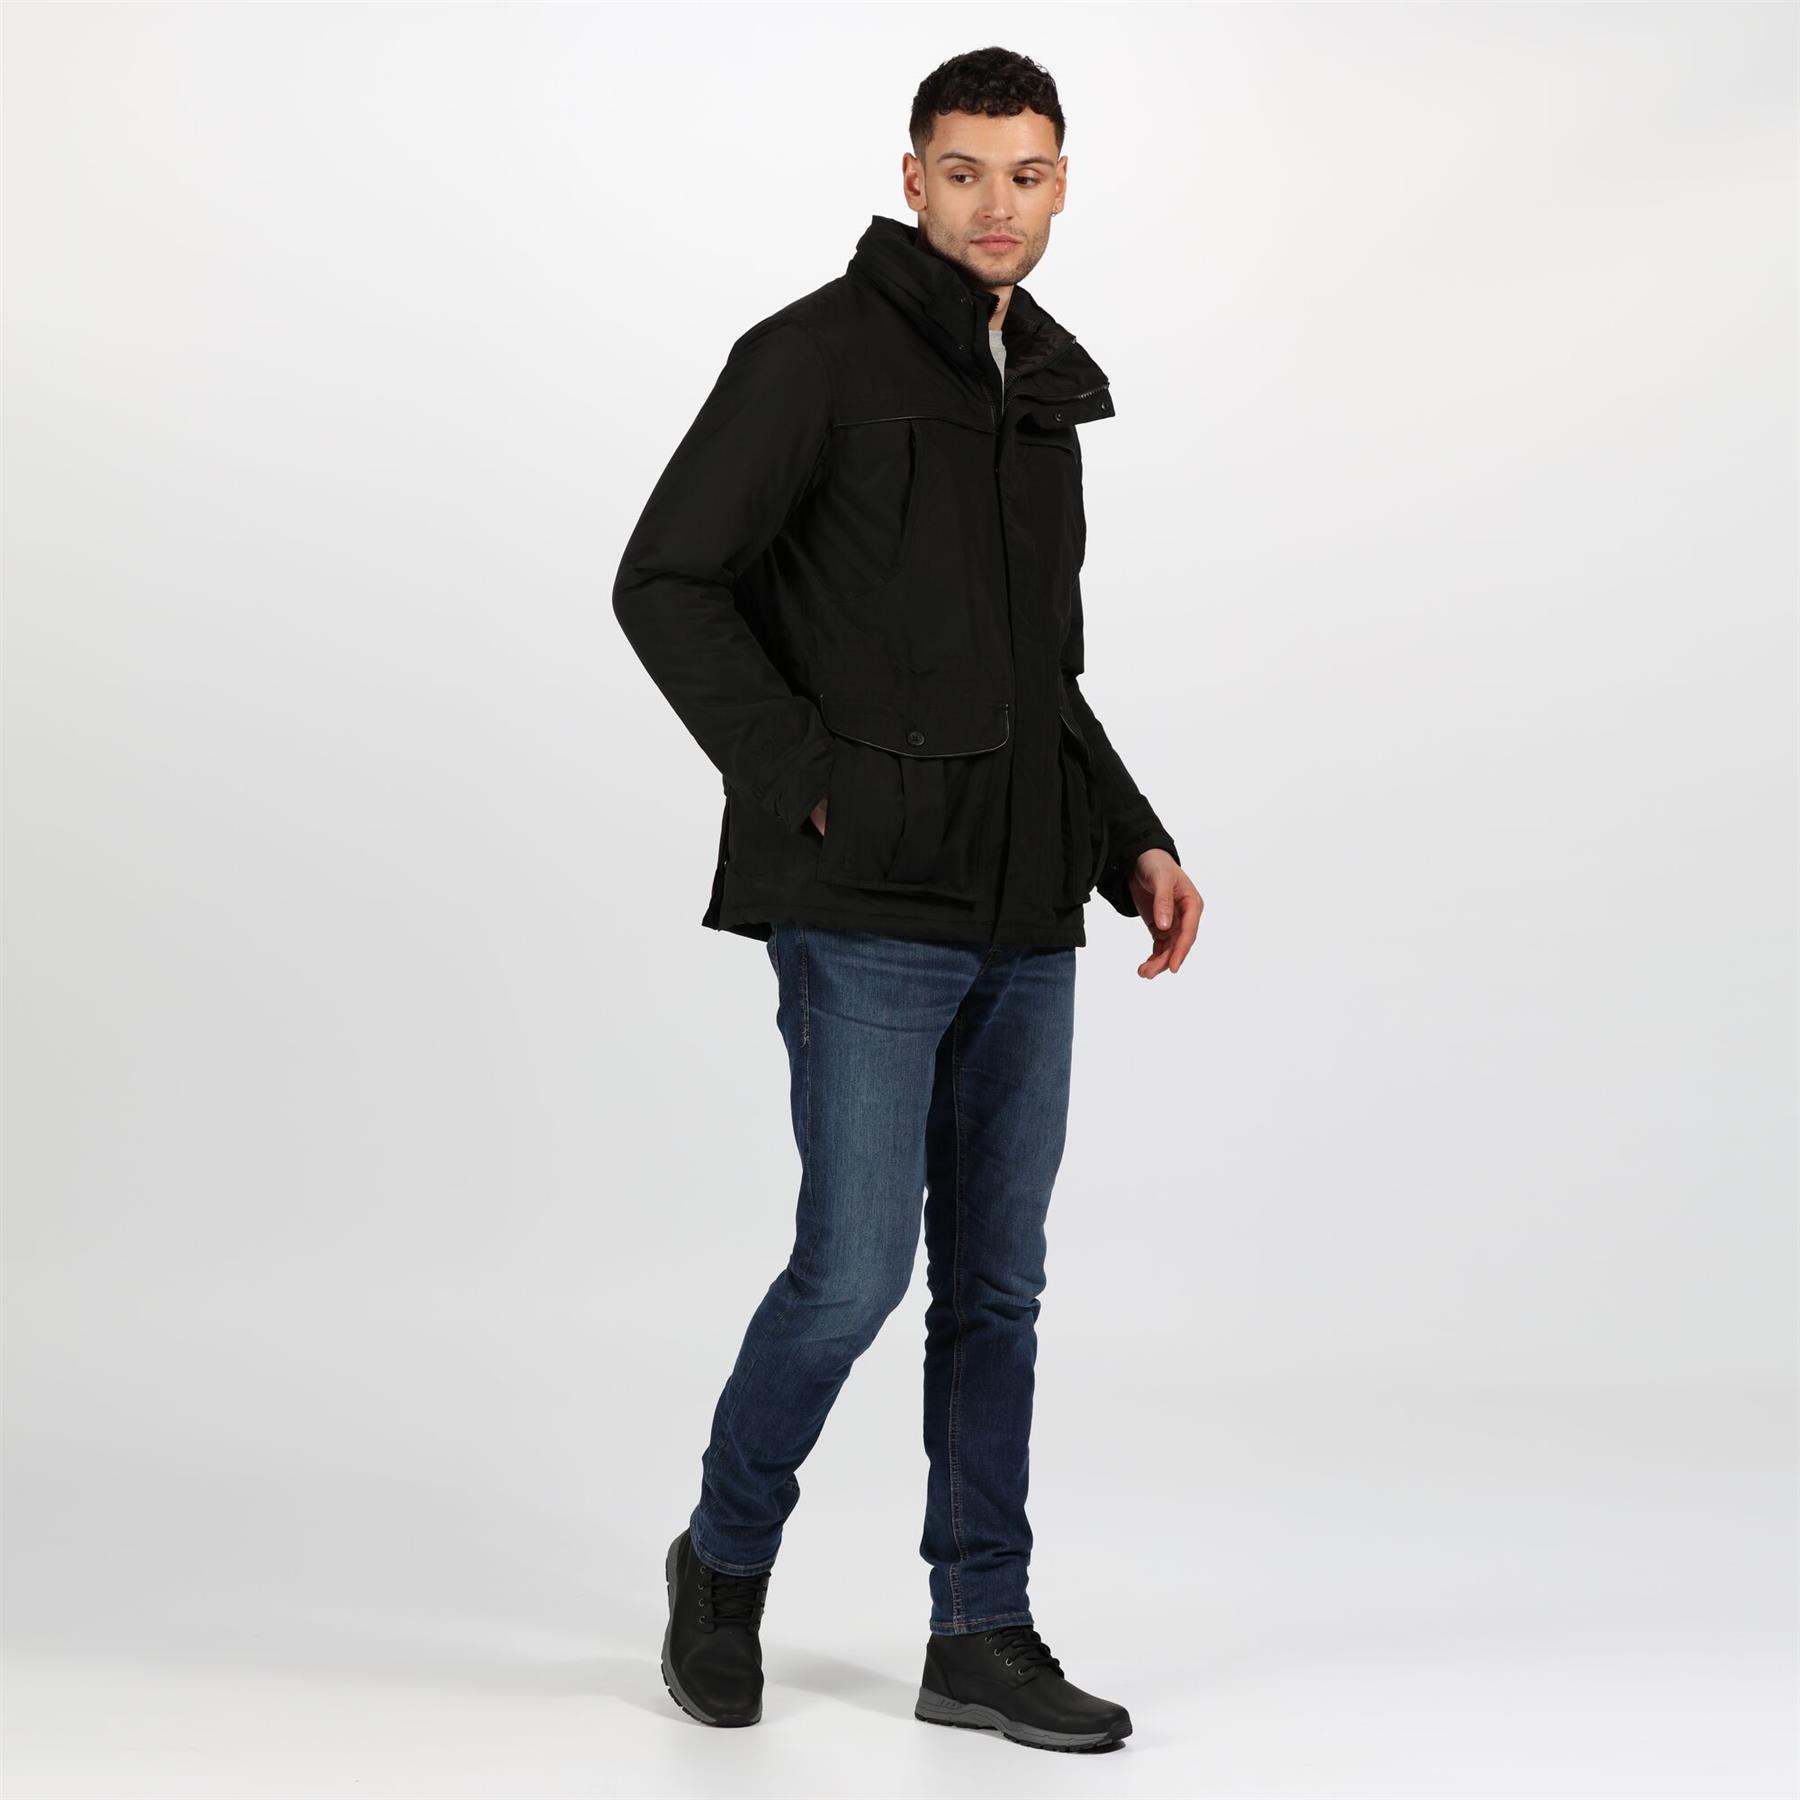 miniatuur 7 - Regatta Mens Rawson Waterproof Breathable Insulated Jacket Coat